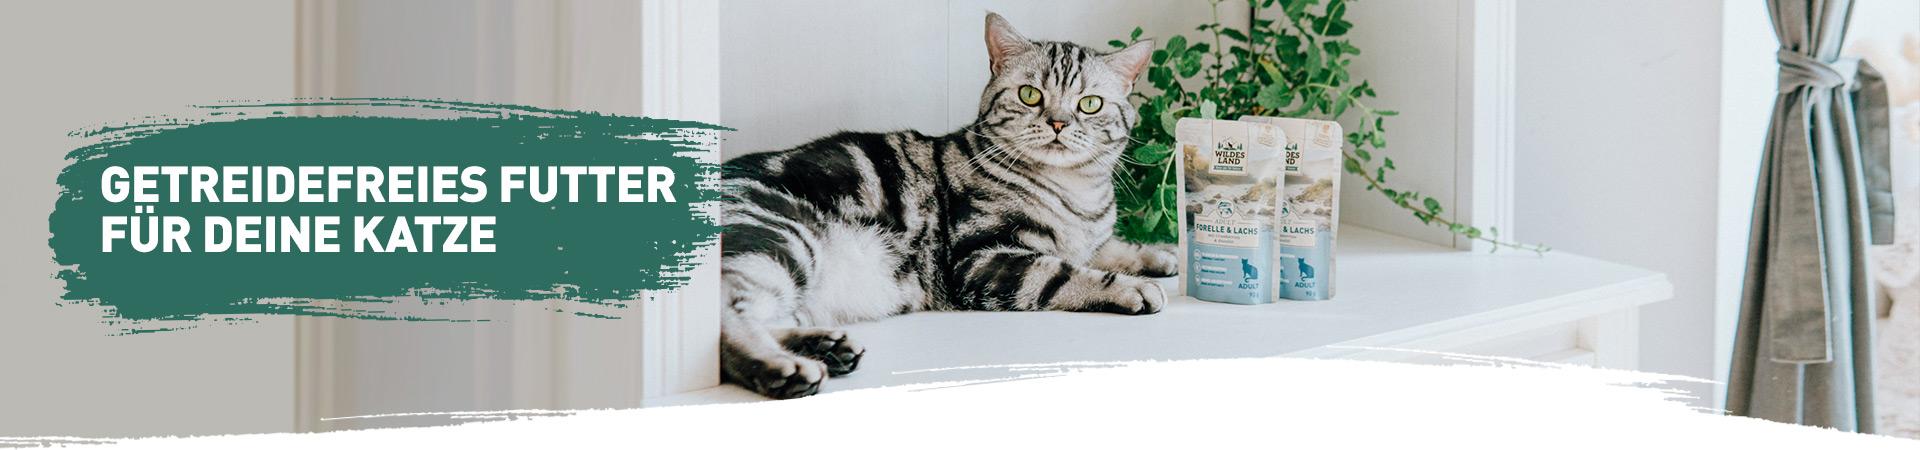 Getreidefreies Futter-Katze